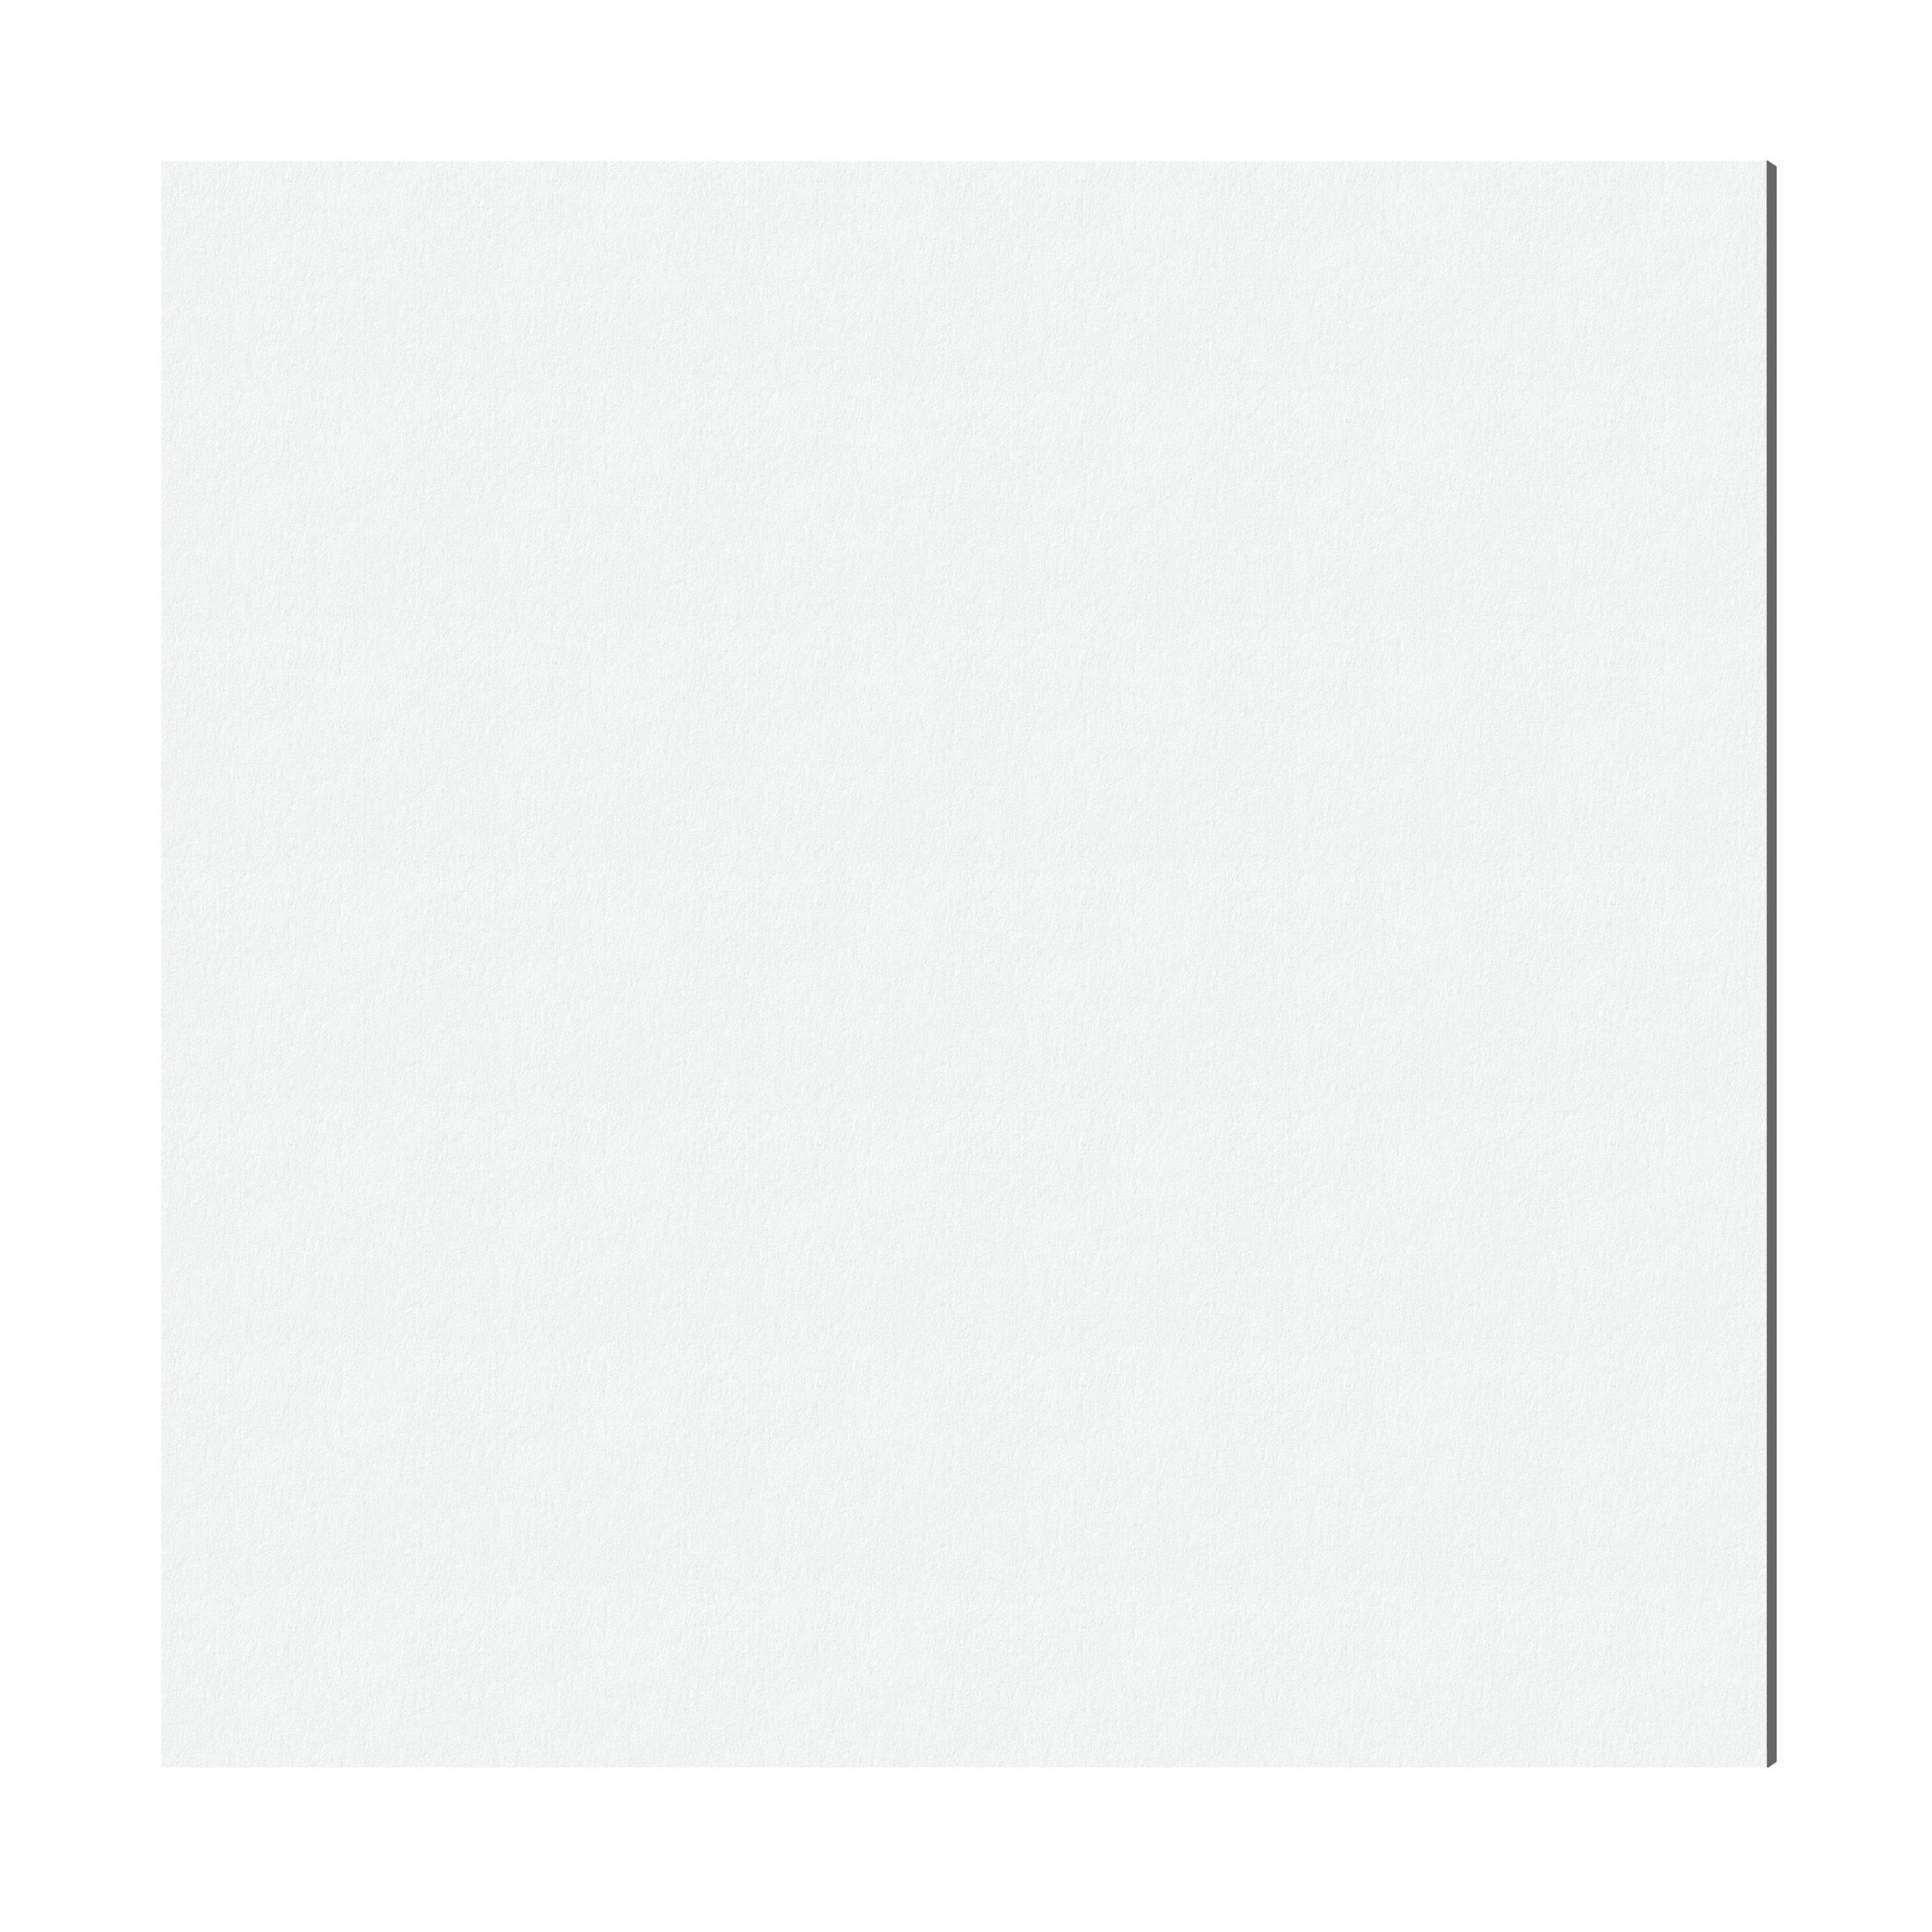 Hintergrundkarton Fur Bilderrahmen Kaufen Bei HALBE Rahmen